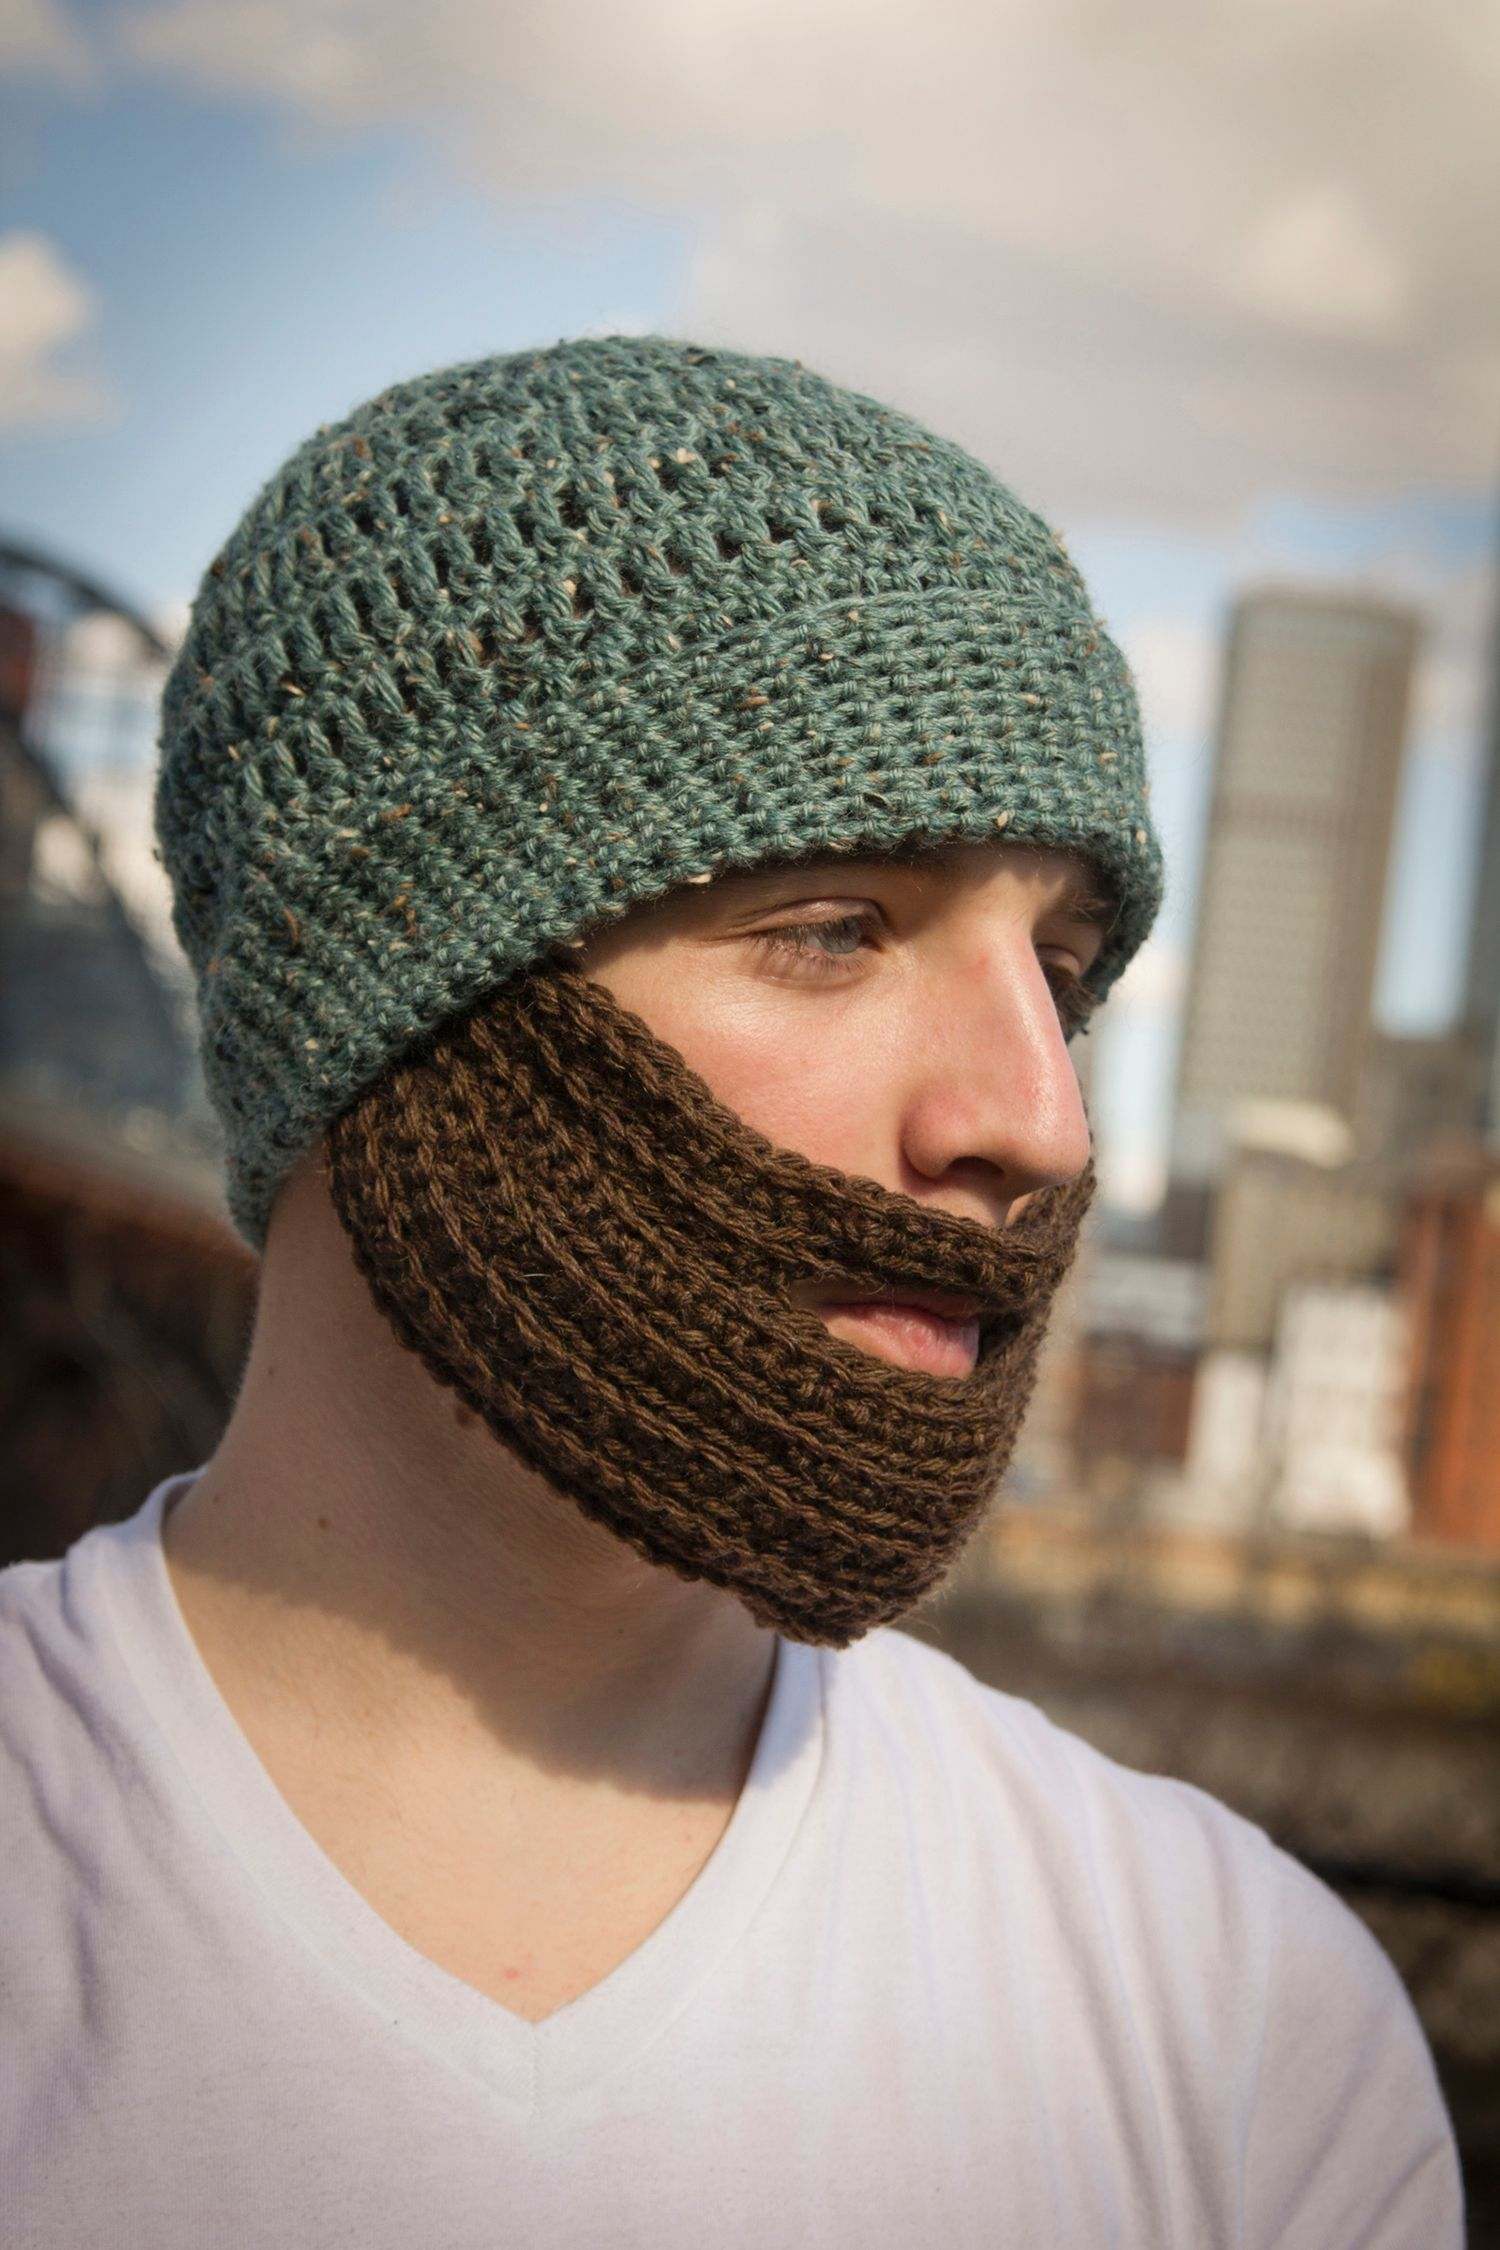 Crochet Bearded Hat - Knitting Patterns and Crochet ...